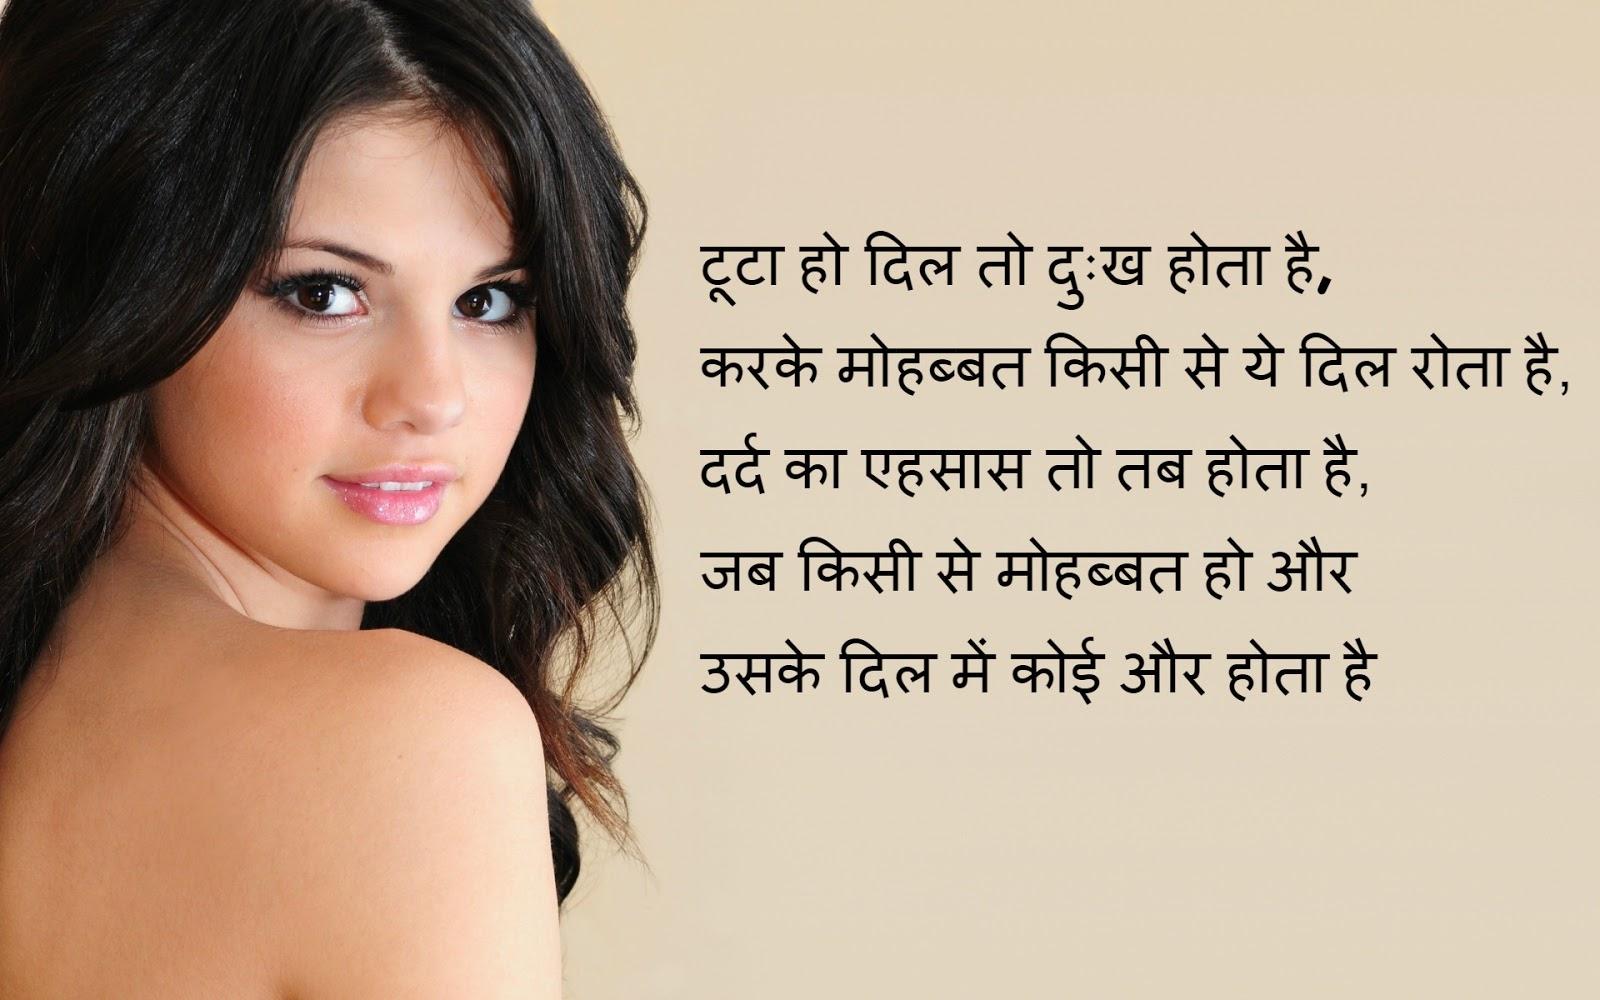 Life hack hindi shayri follow followforfollow lol complicated follow my writings on